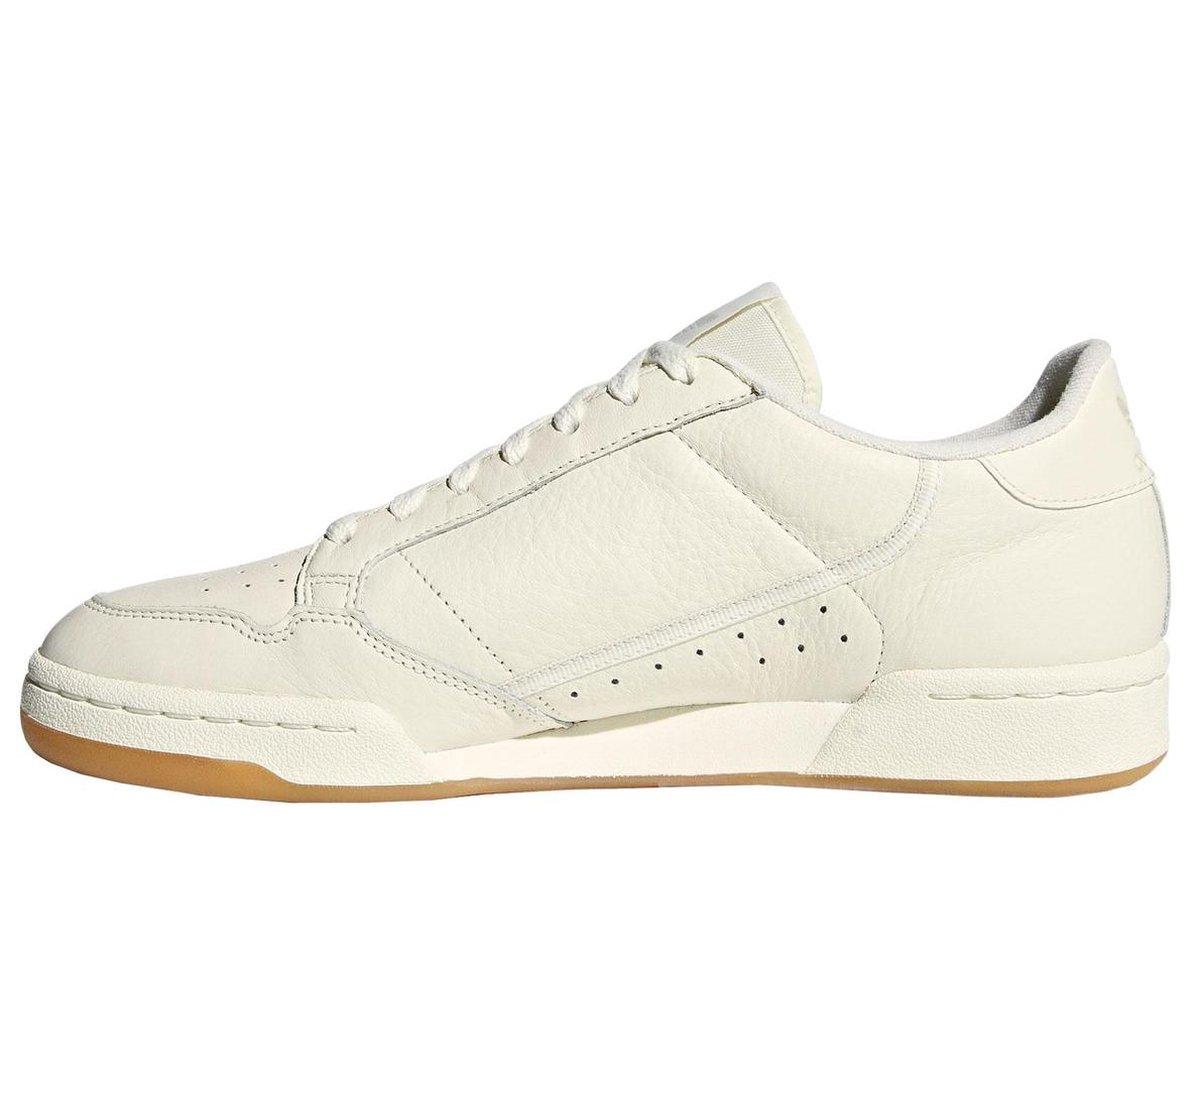 bol.com | adidas Continental 80 Sneakers - Maat 40 2/3 ...